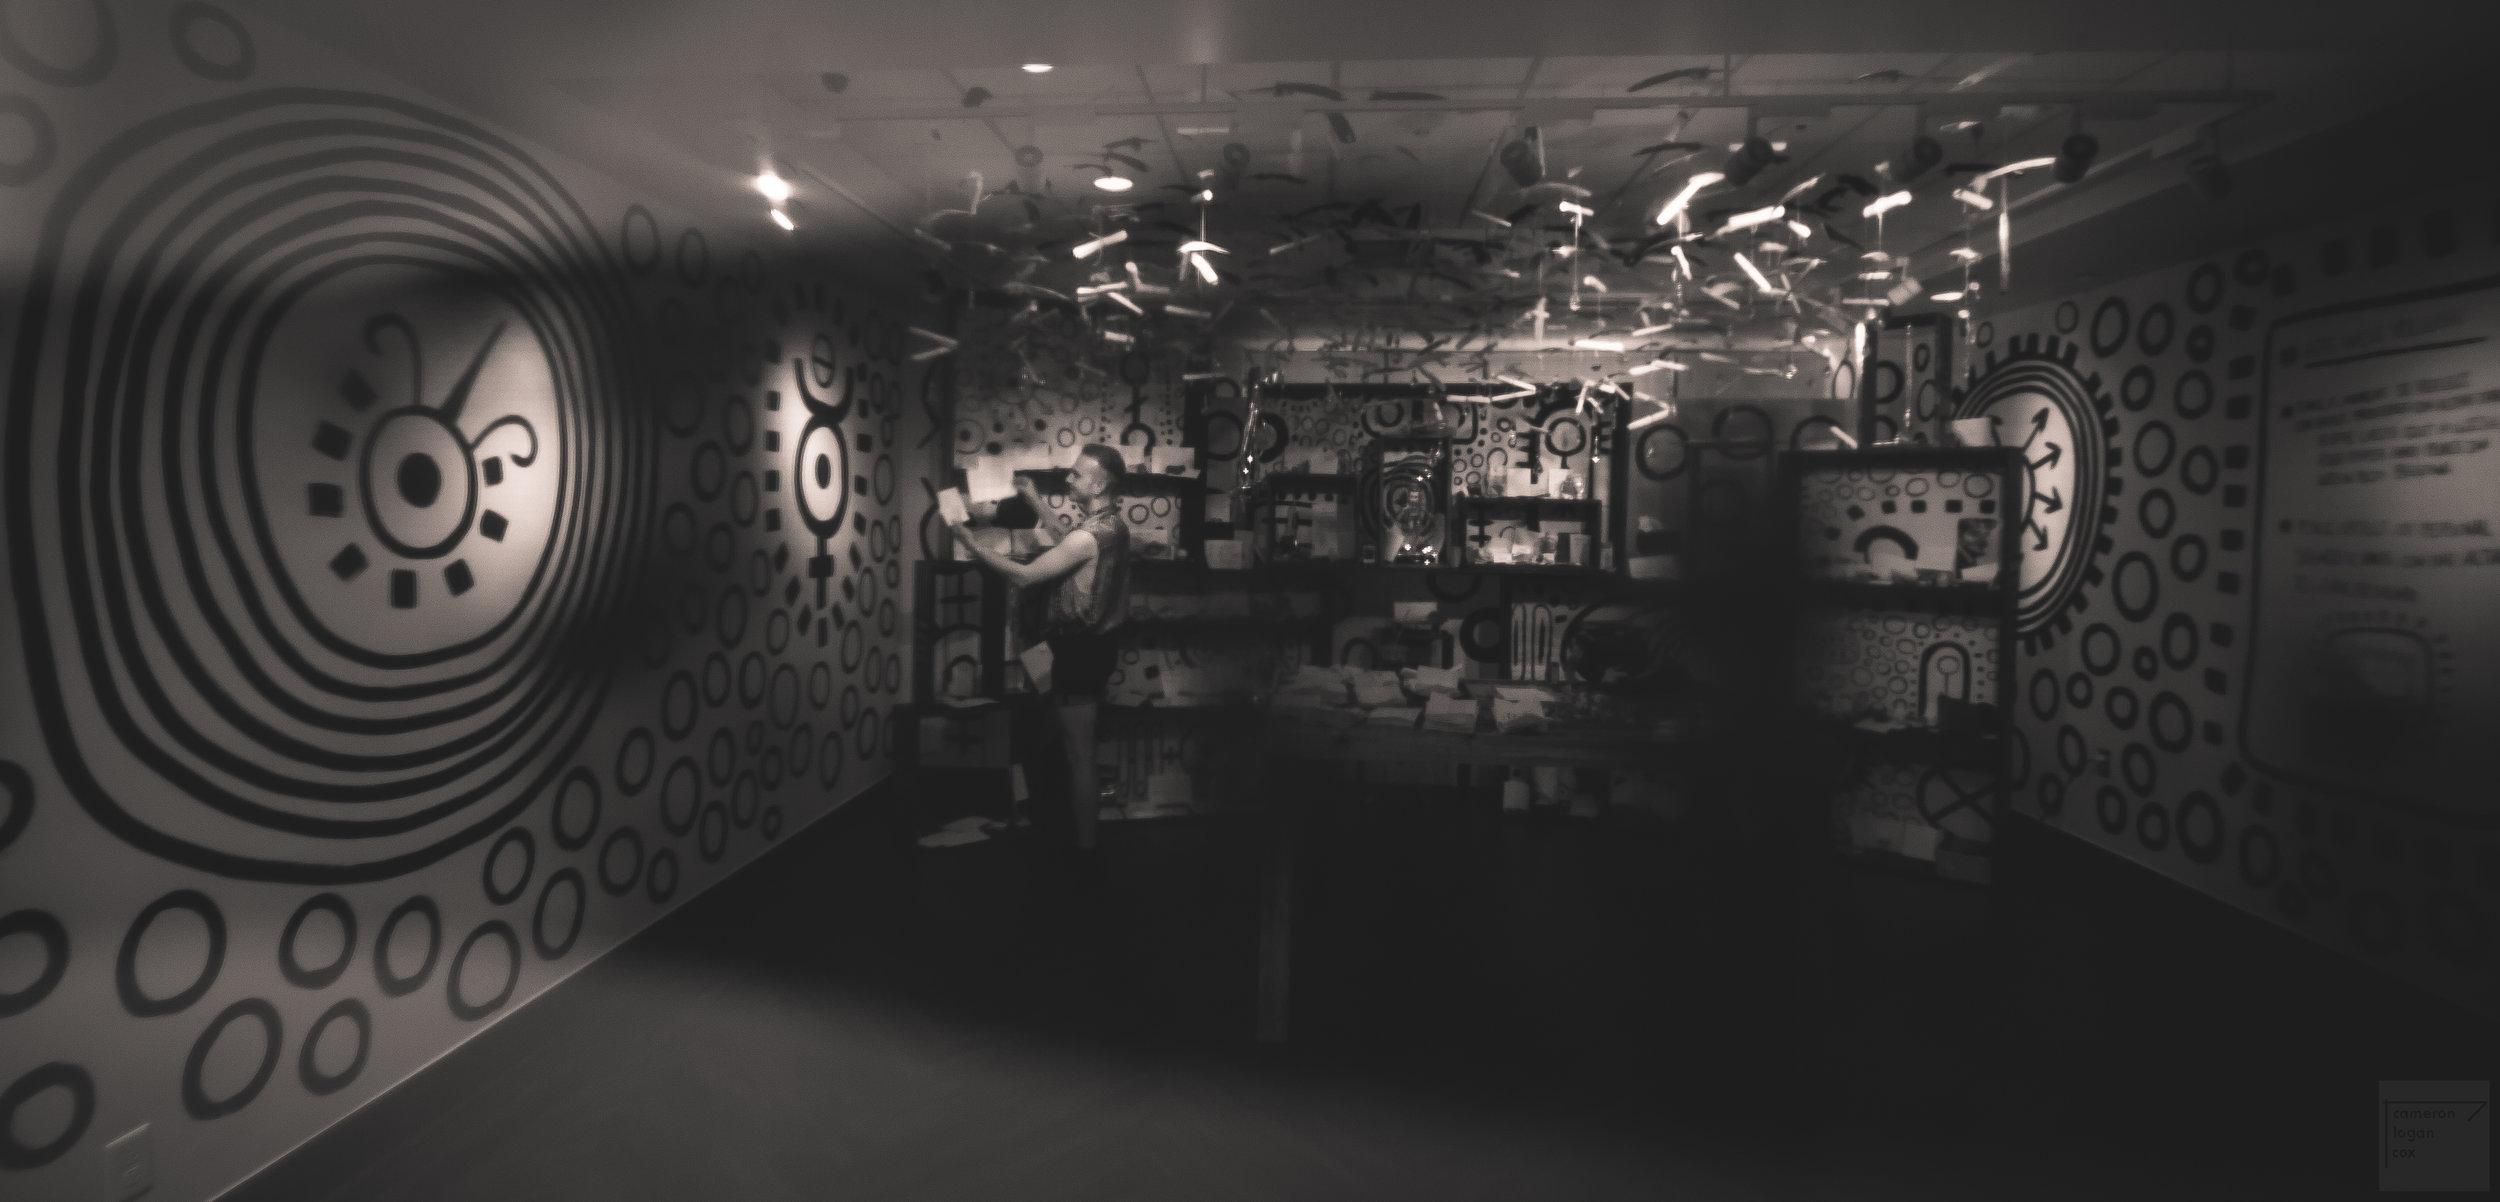 ryan wilks kansas city artist artists inc midwest arts alliance painting here where you wish ari fish sean prudden tim harte dungeon master (8 of 57).jpg